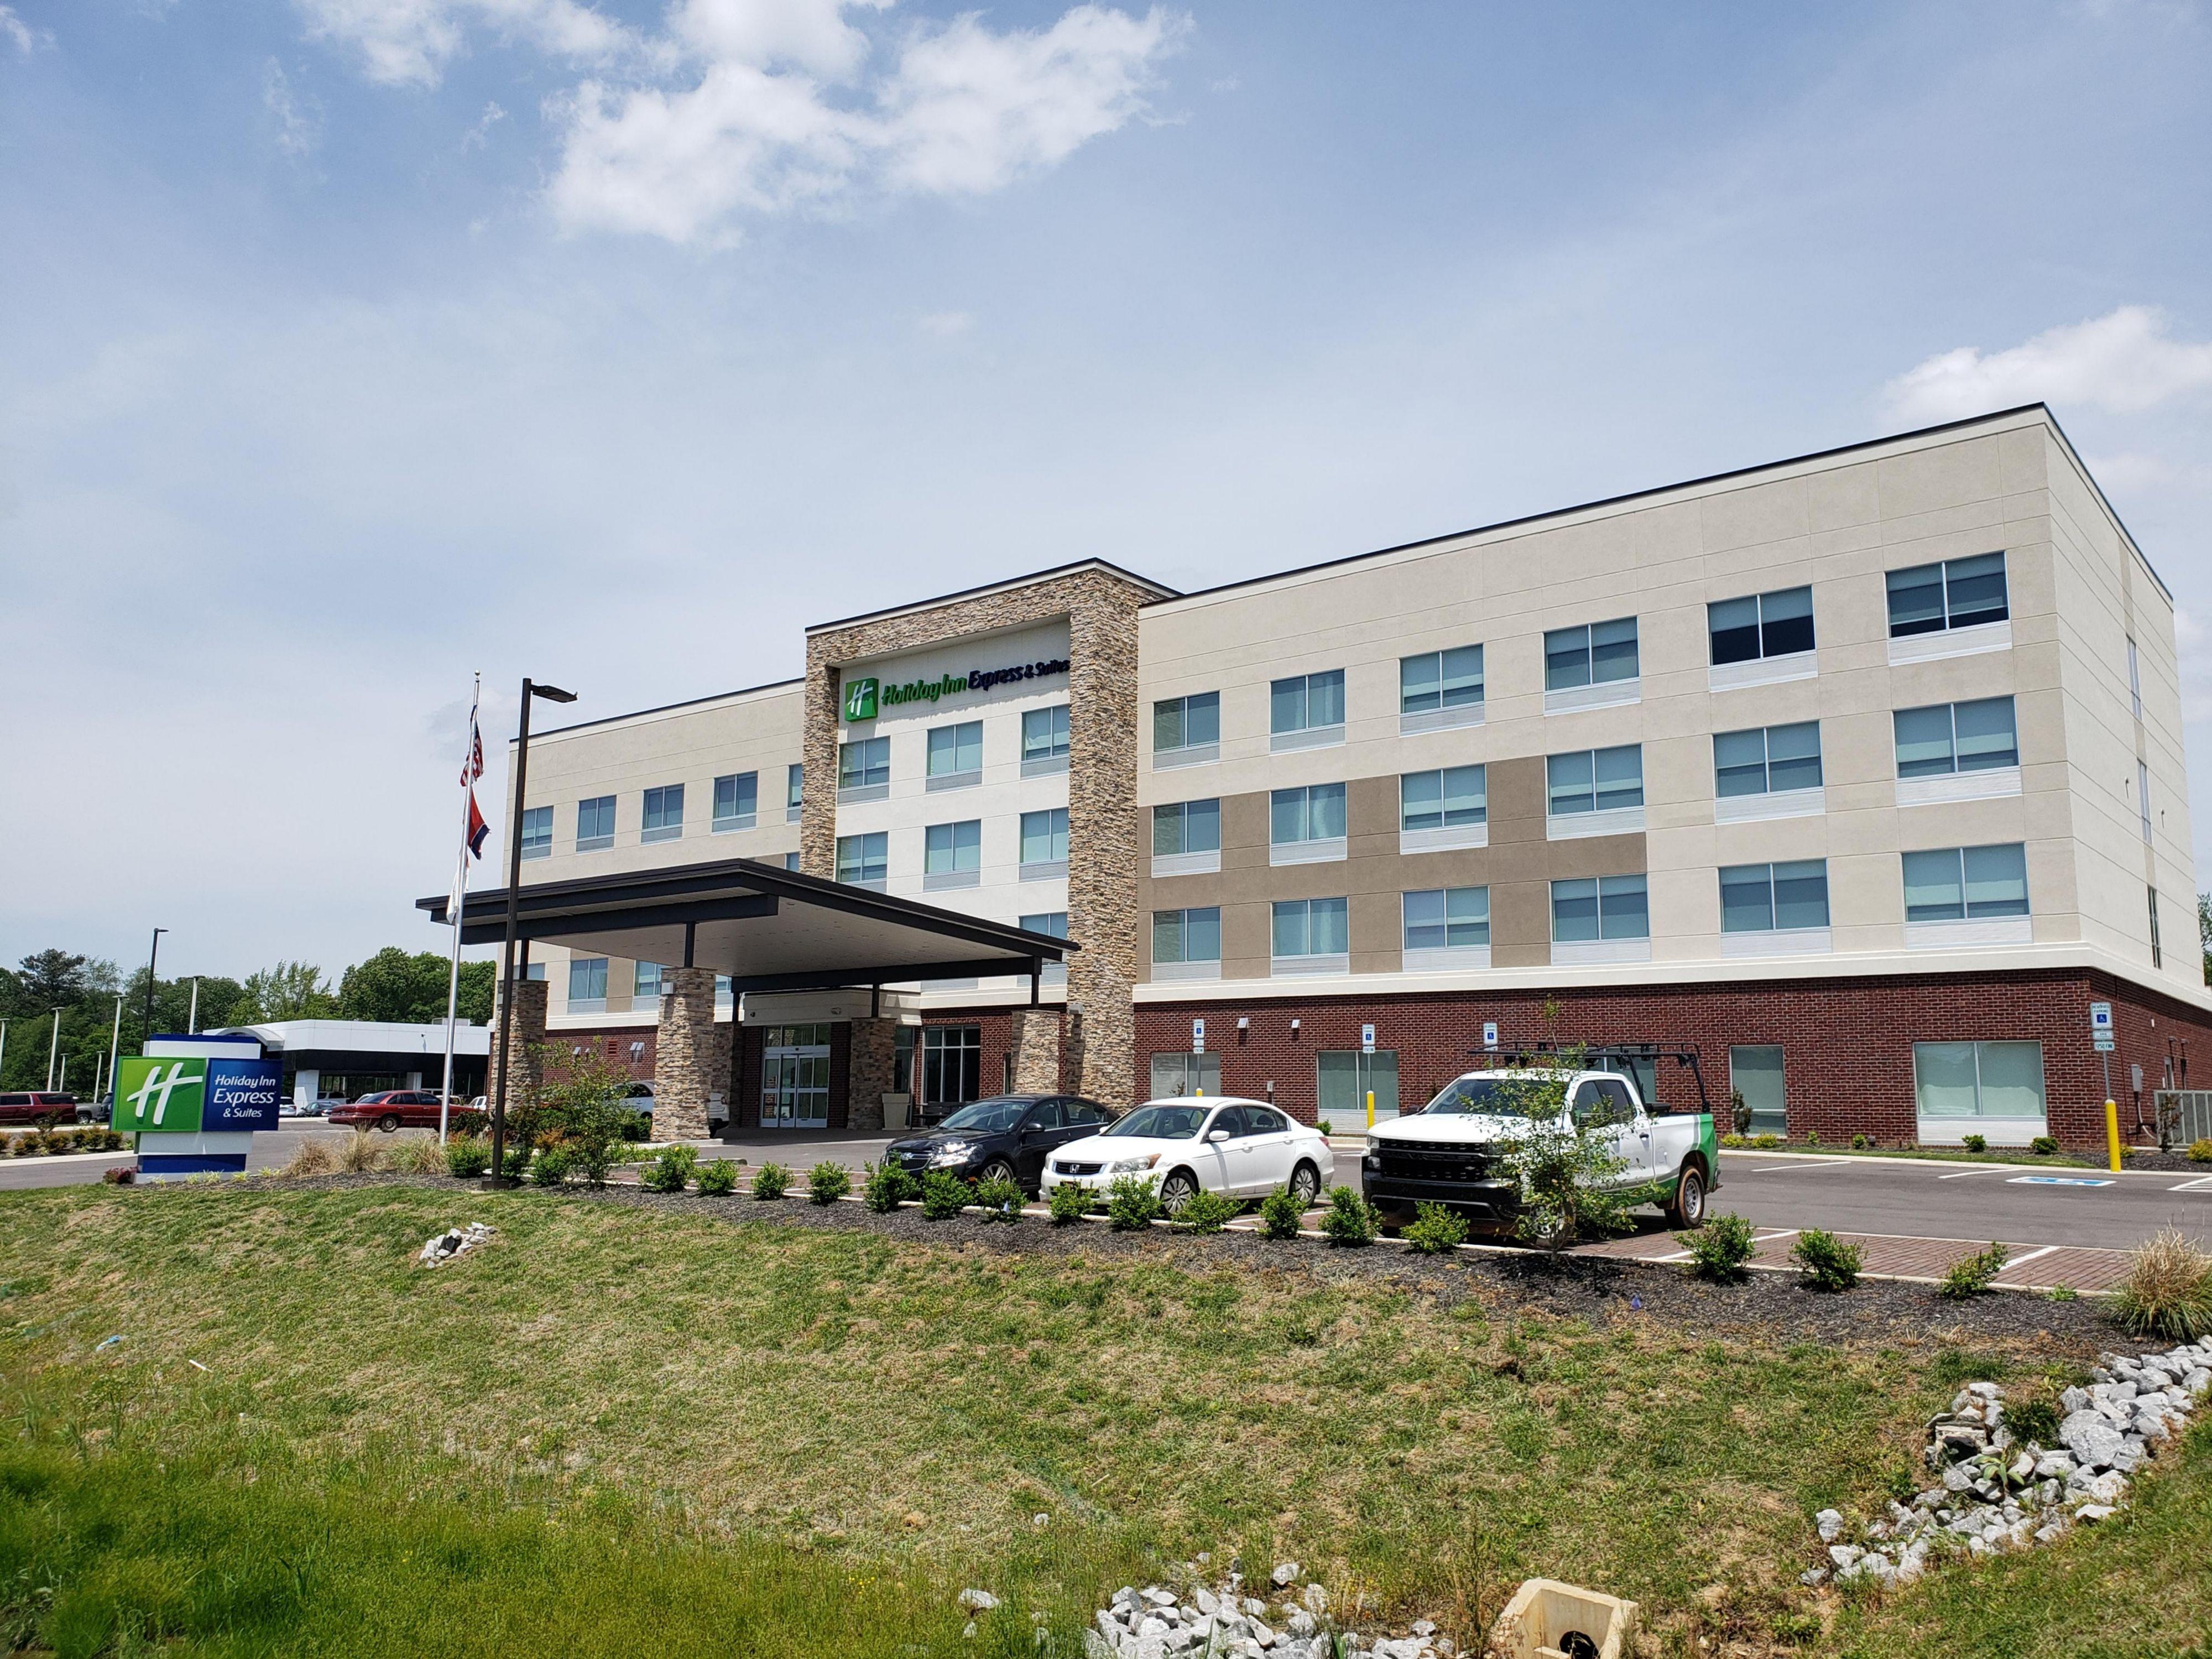 Clarksville Hotels Top 6 In Tn By Ihg